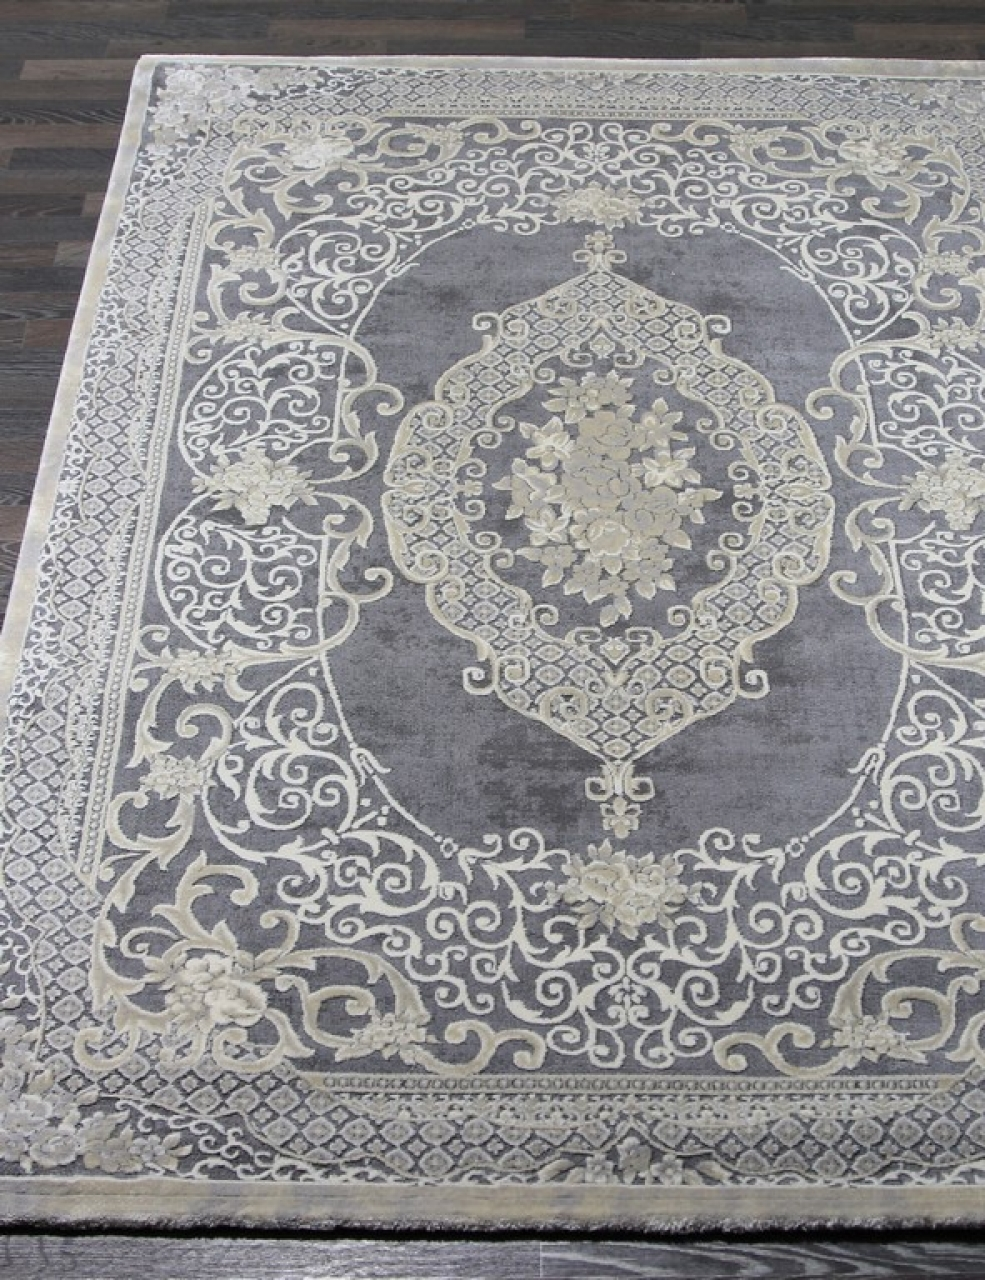 Ковер 17189 - 095 - Прямоугольник - коллекция THEMA